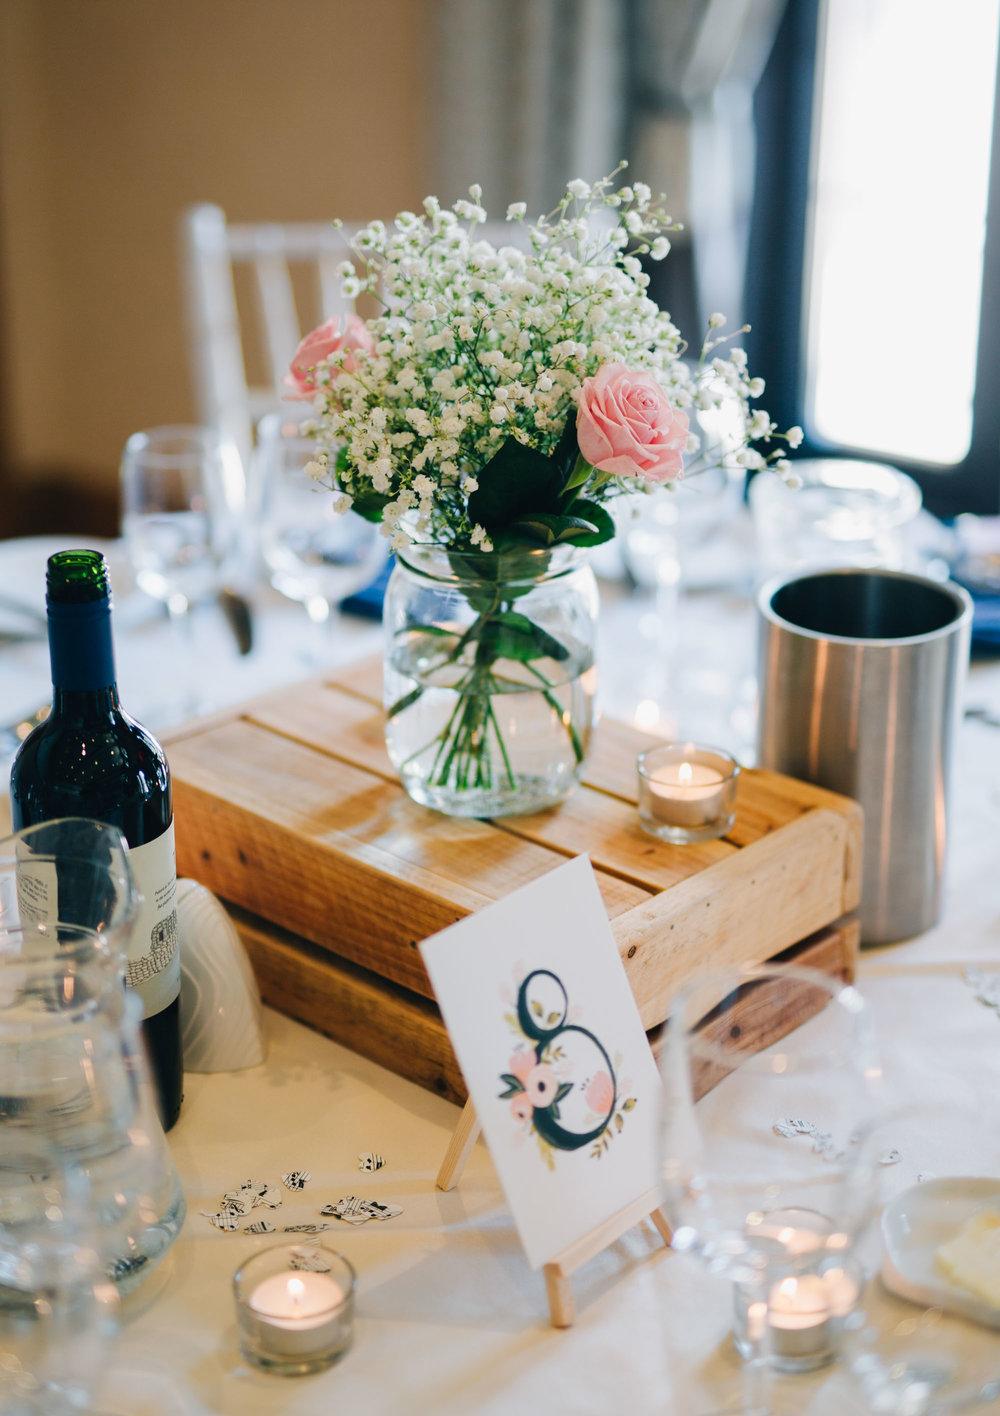 Table decorations at Ashton Memorial, Wedding decorations, Creative wedding photos.